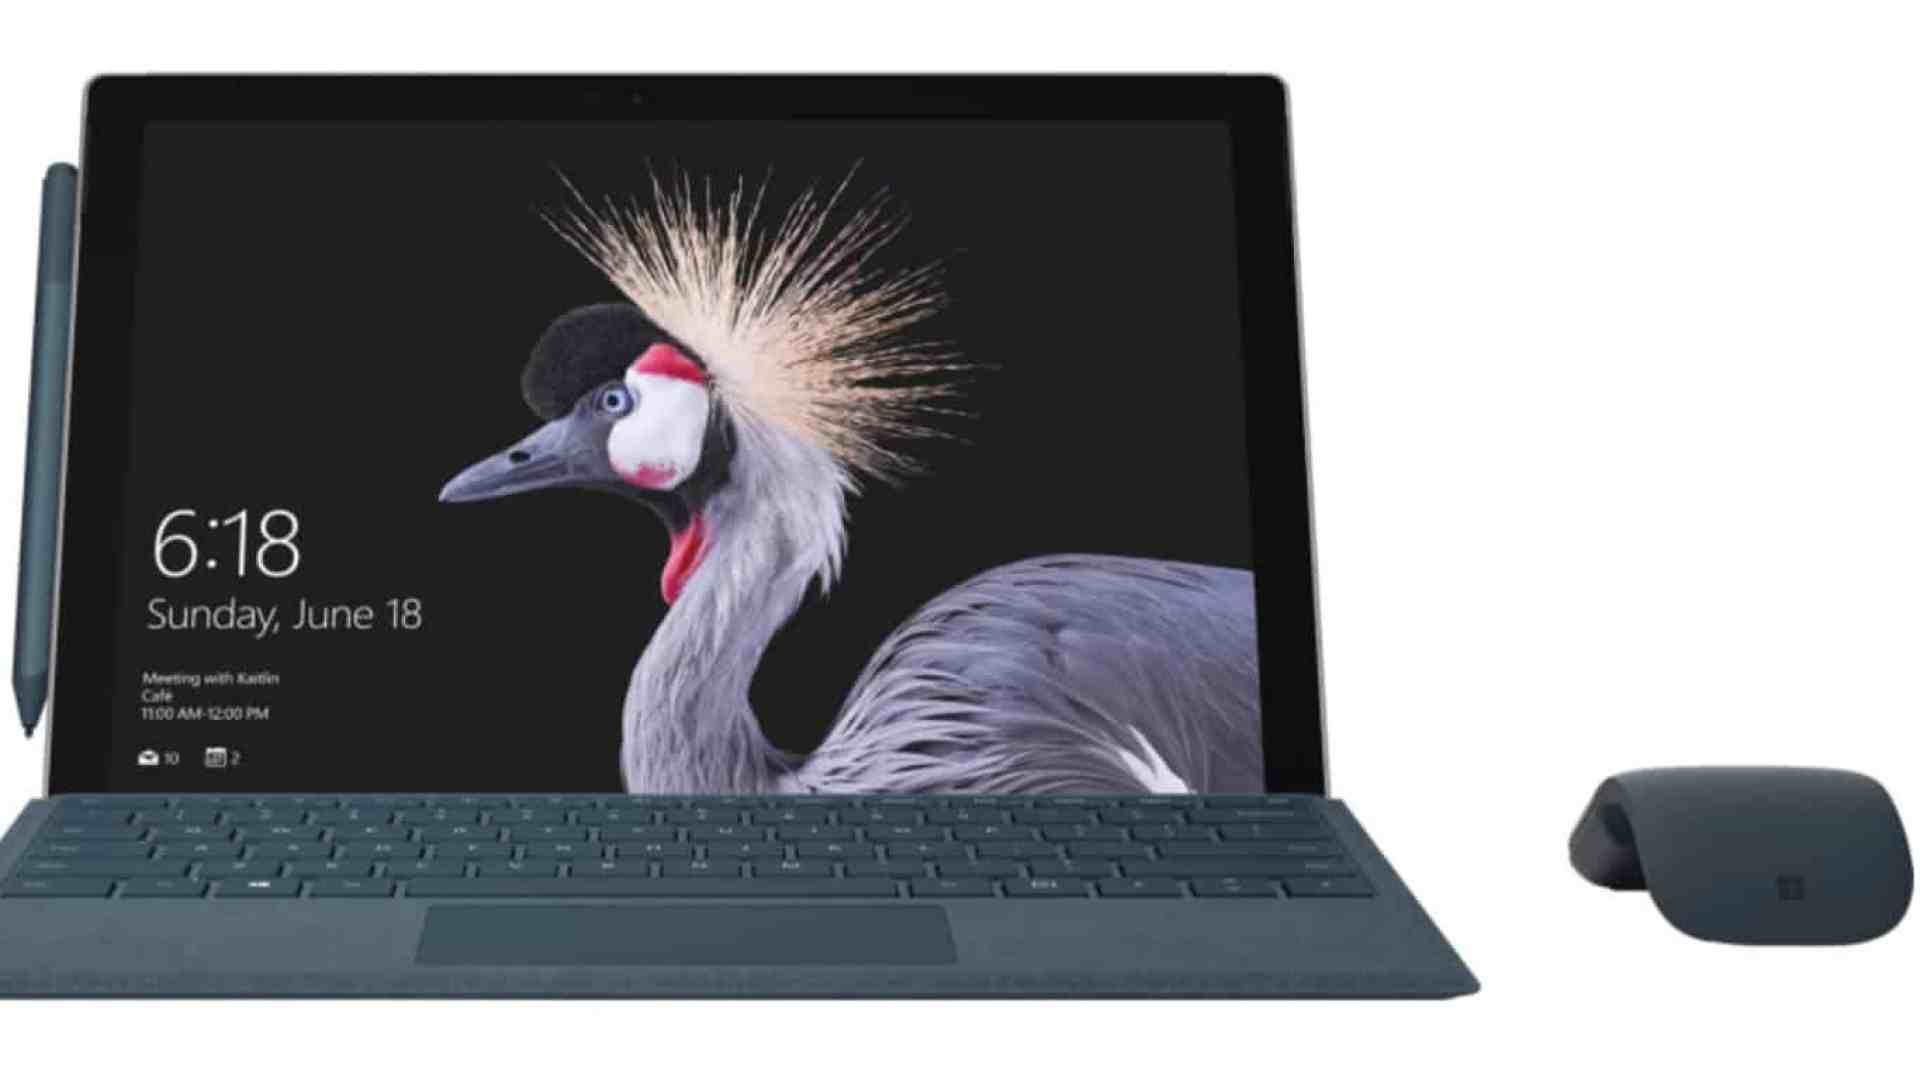 Microsoft's Surface Pro 5